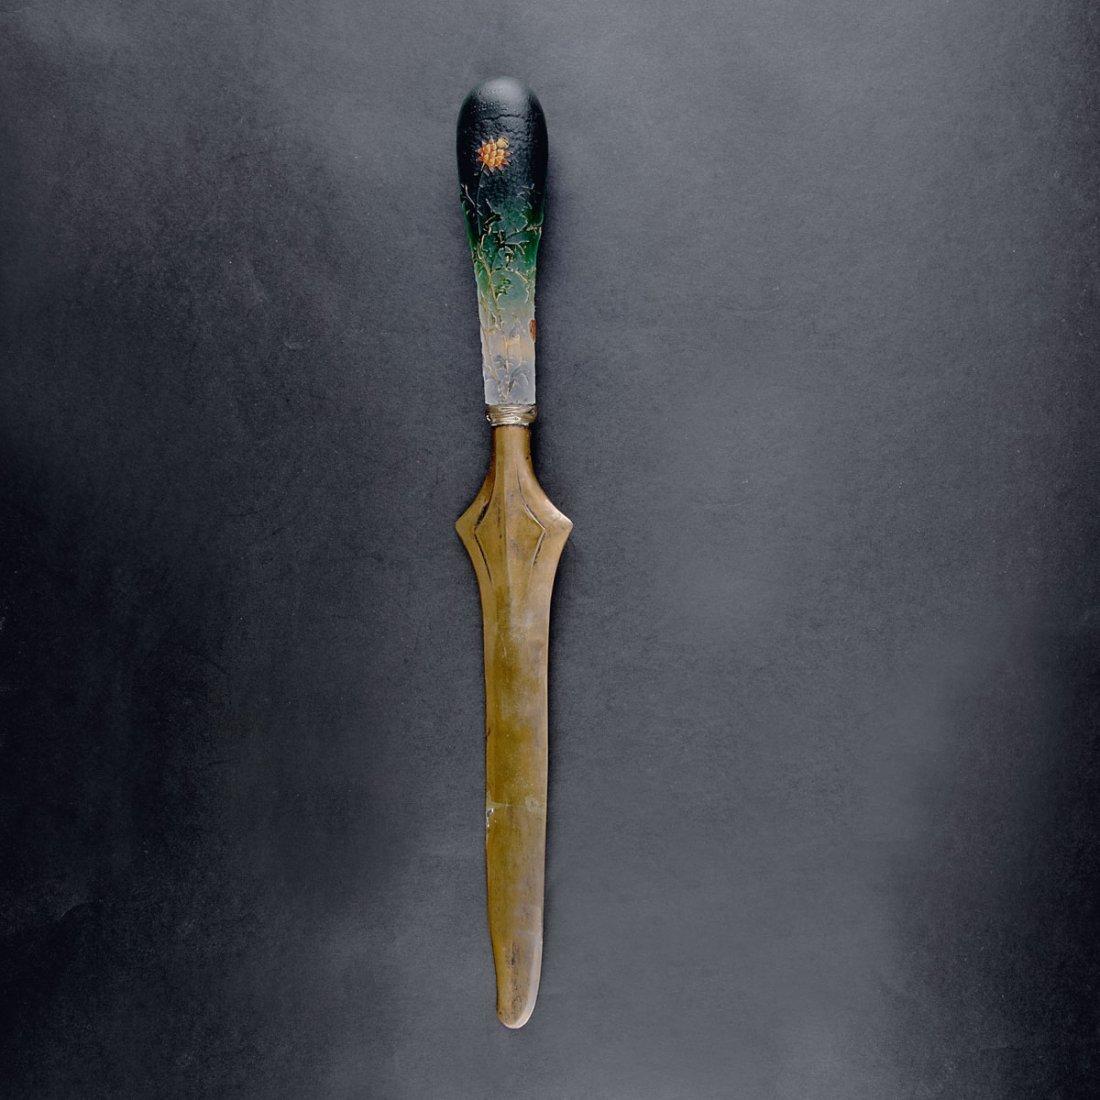 Daum Freres, Nancy. 'Chardons' paper knife, c1895. L.